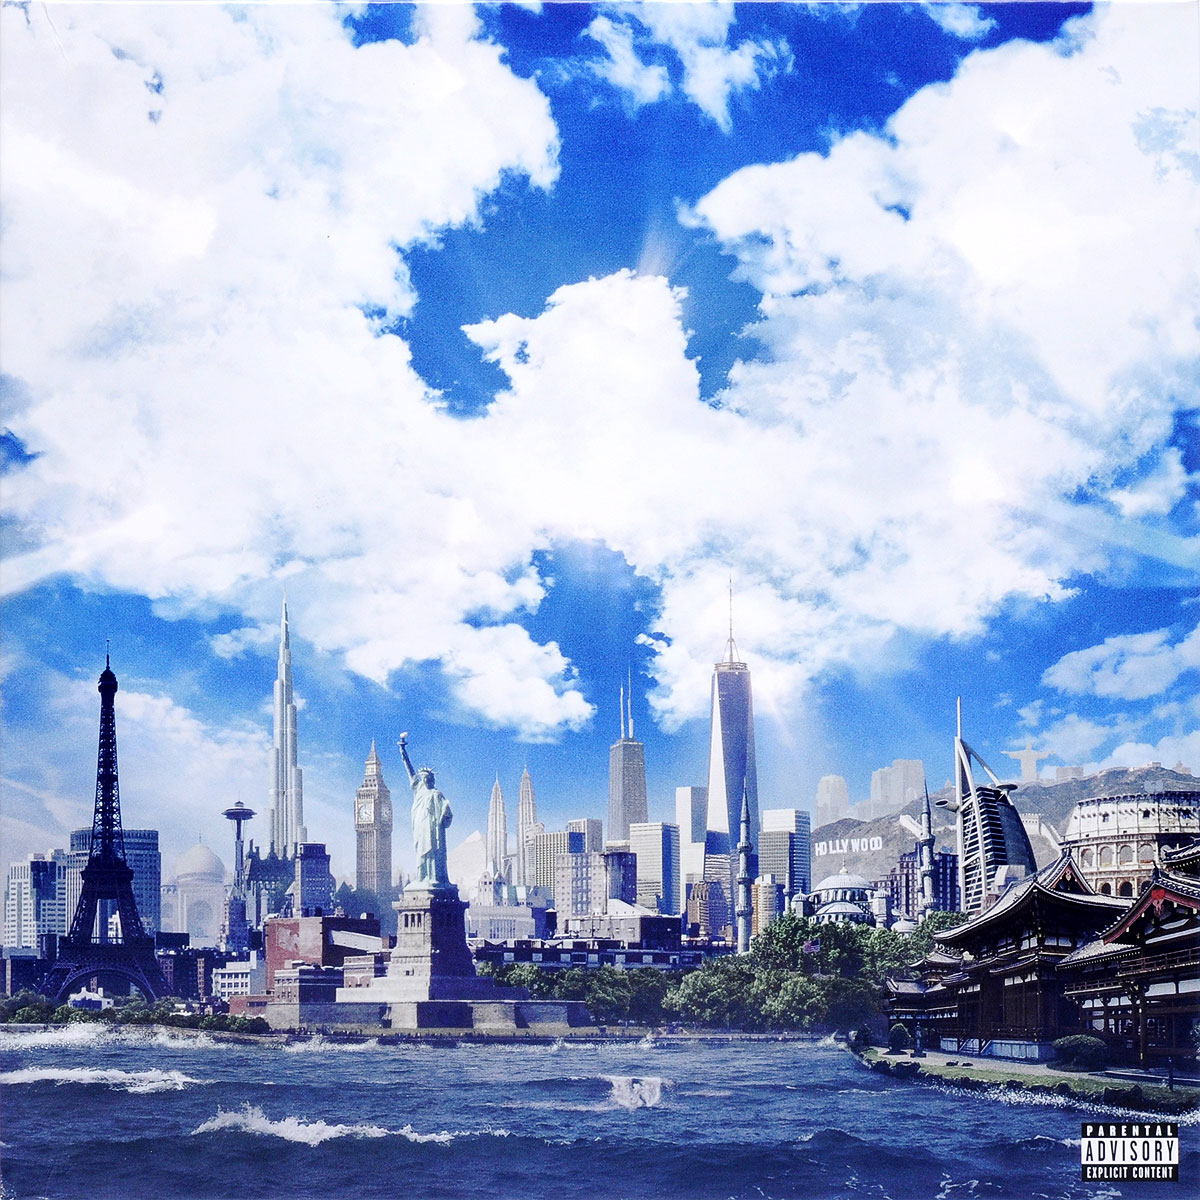 Wu-Tang Clan Wu-Tang Clan. A Better Tomorrow (2 LP) wu tang clan wu tang clan legend of the wu tang greatest hits 2 lp